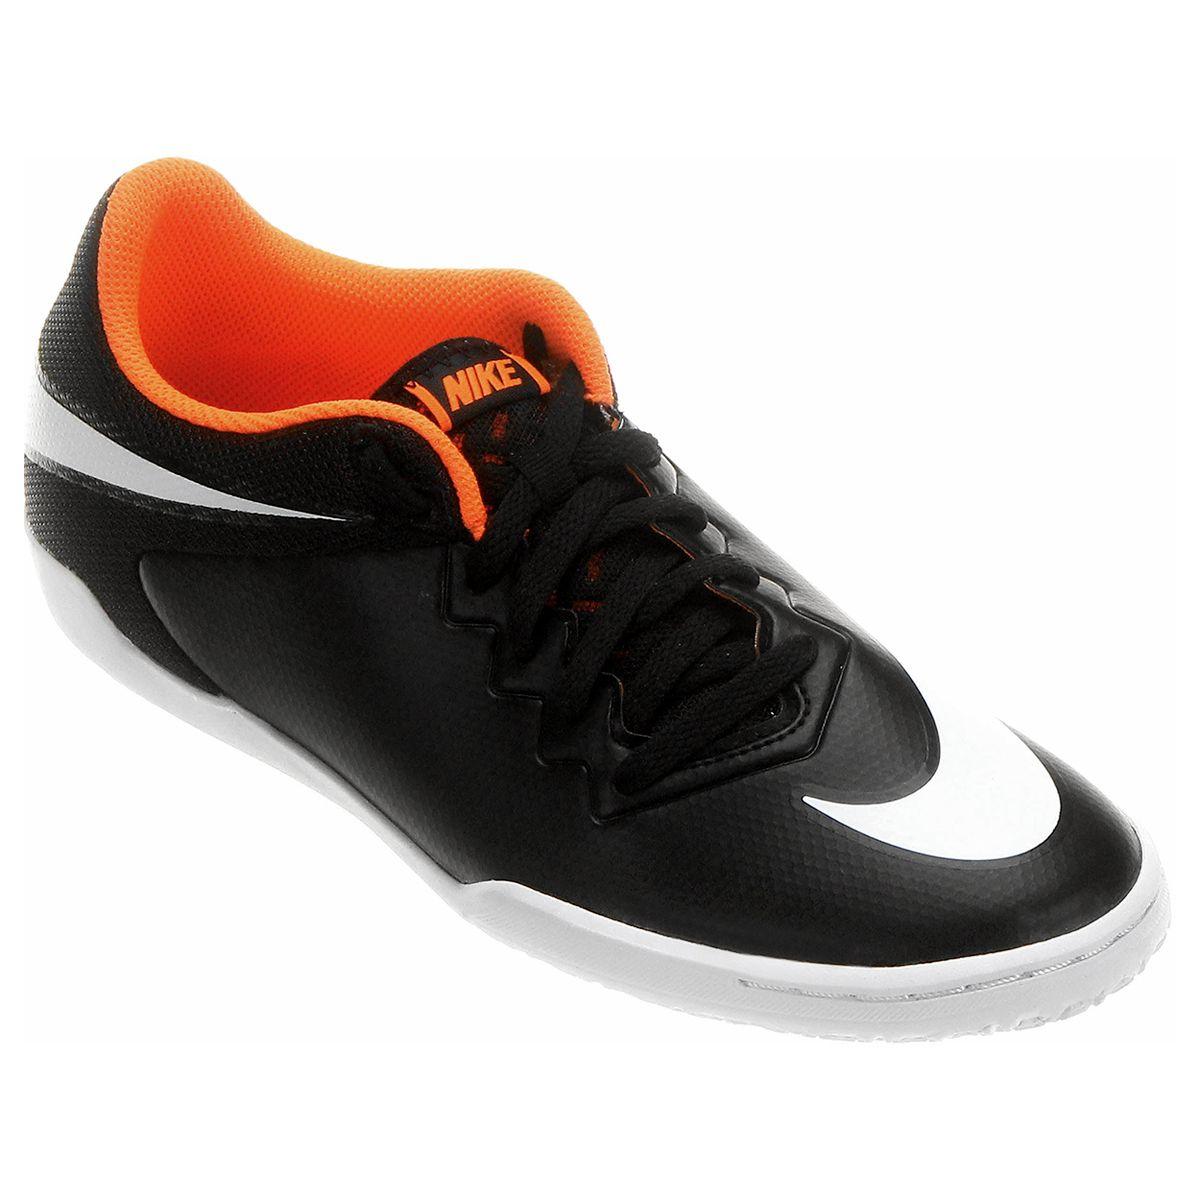 Chuteira Nike Hypervenom Pro Street IC Futsal Preto e Branco | Netshoes